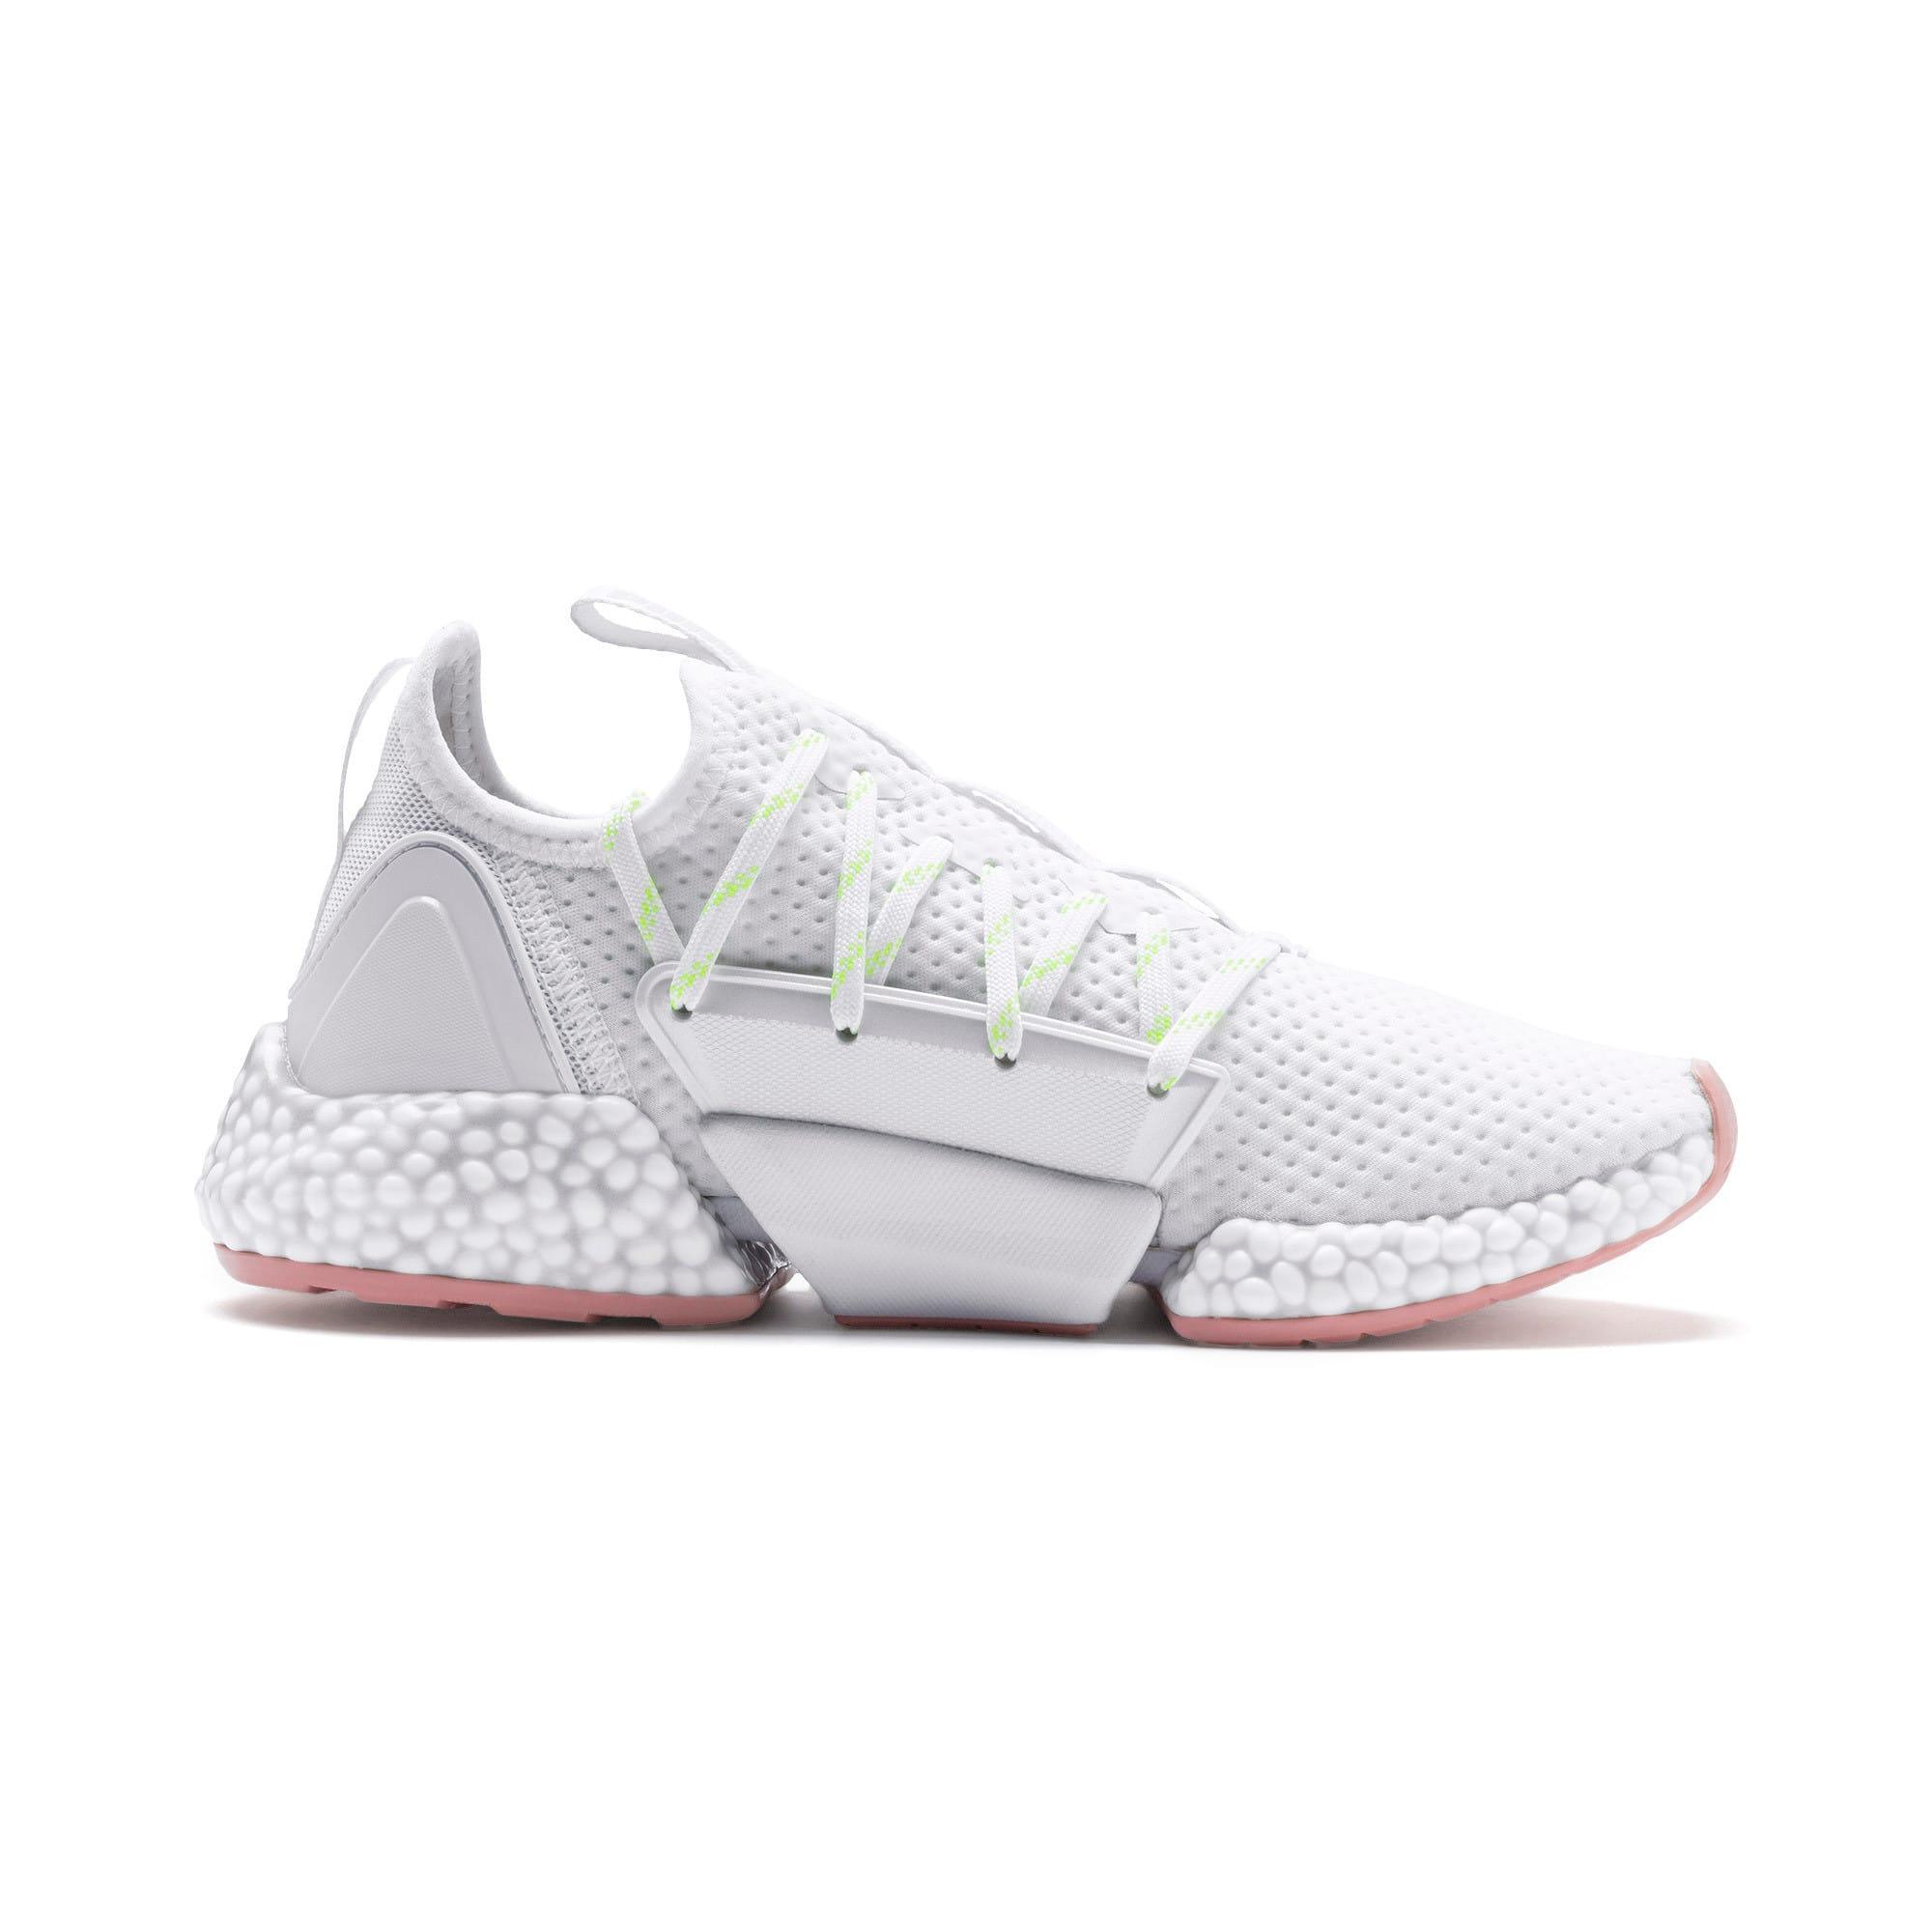 Thumbnail 6 of HYBRID Rocket Aero Women's Running Shoes, Puma White-Bridal Rose, medium